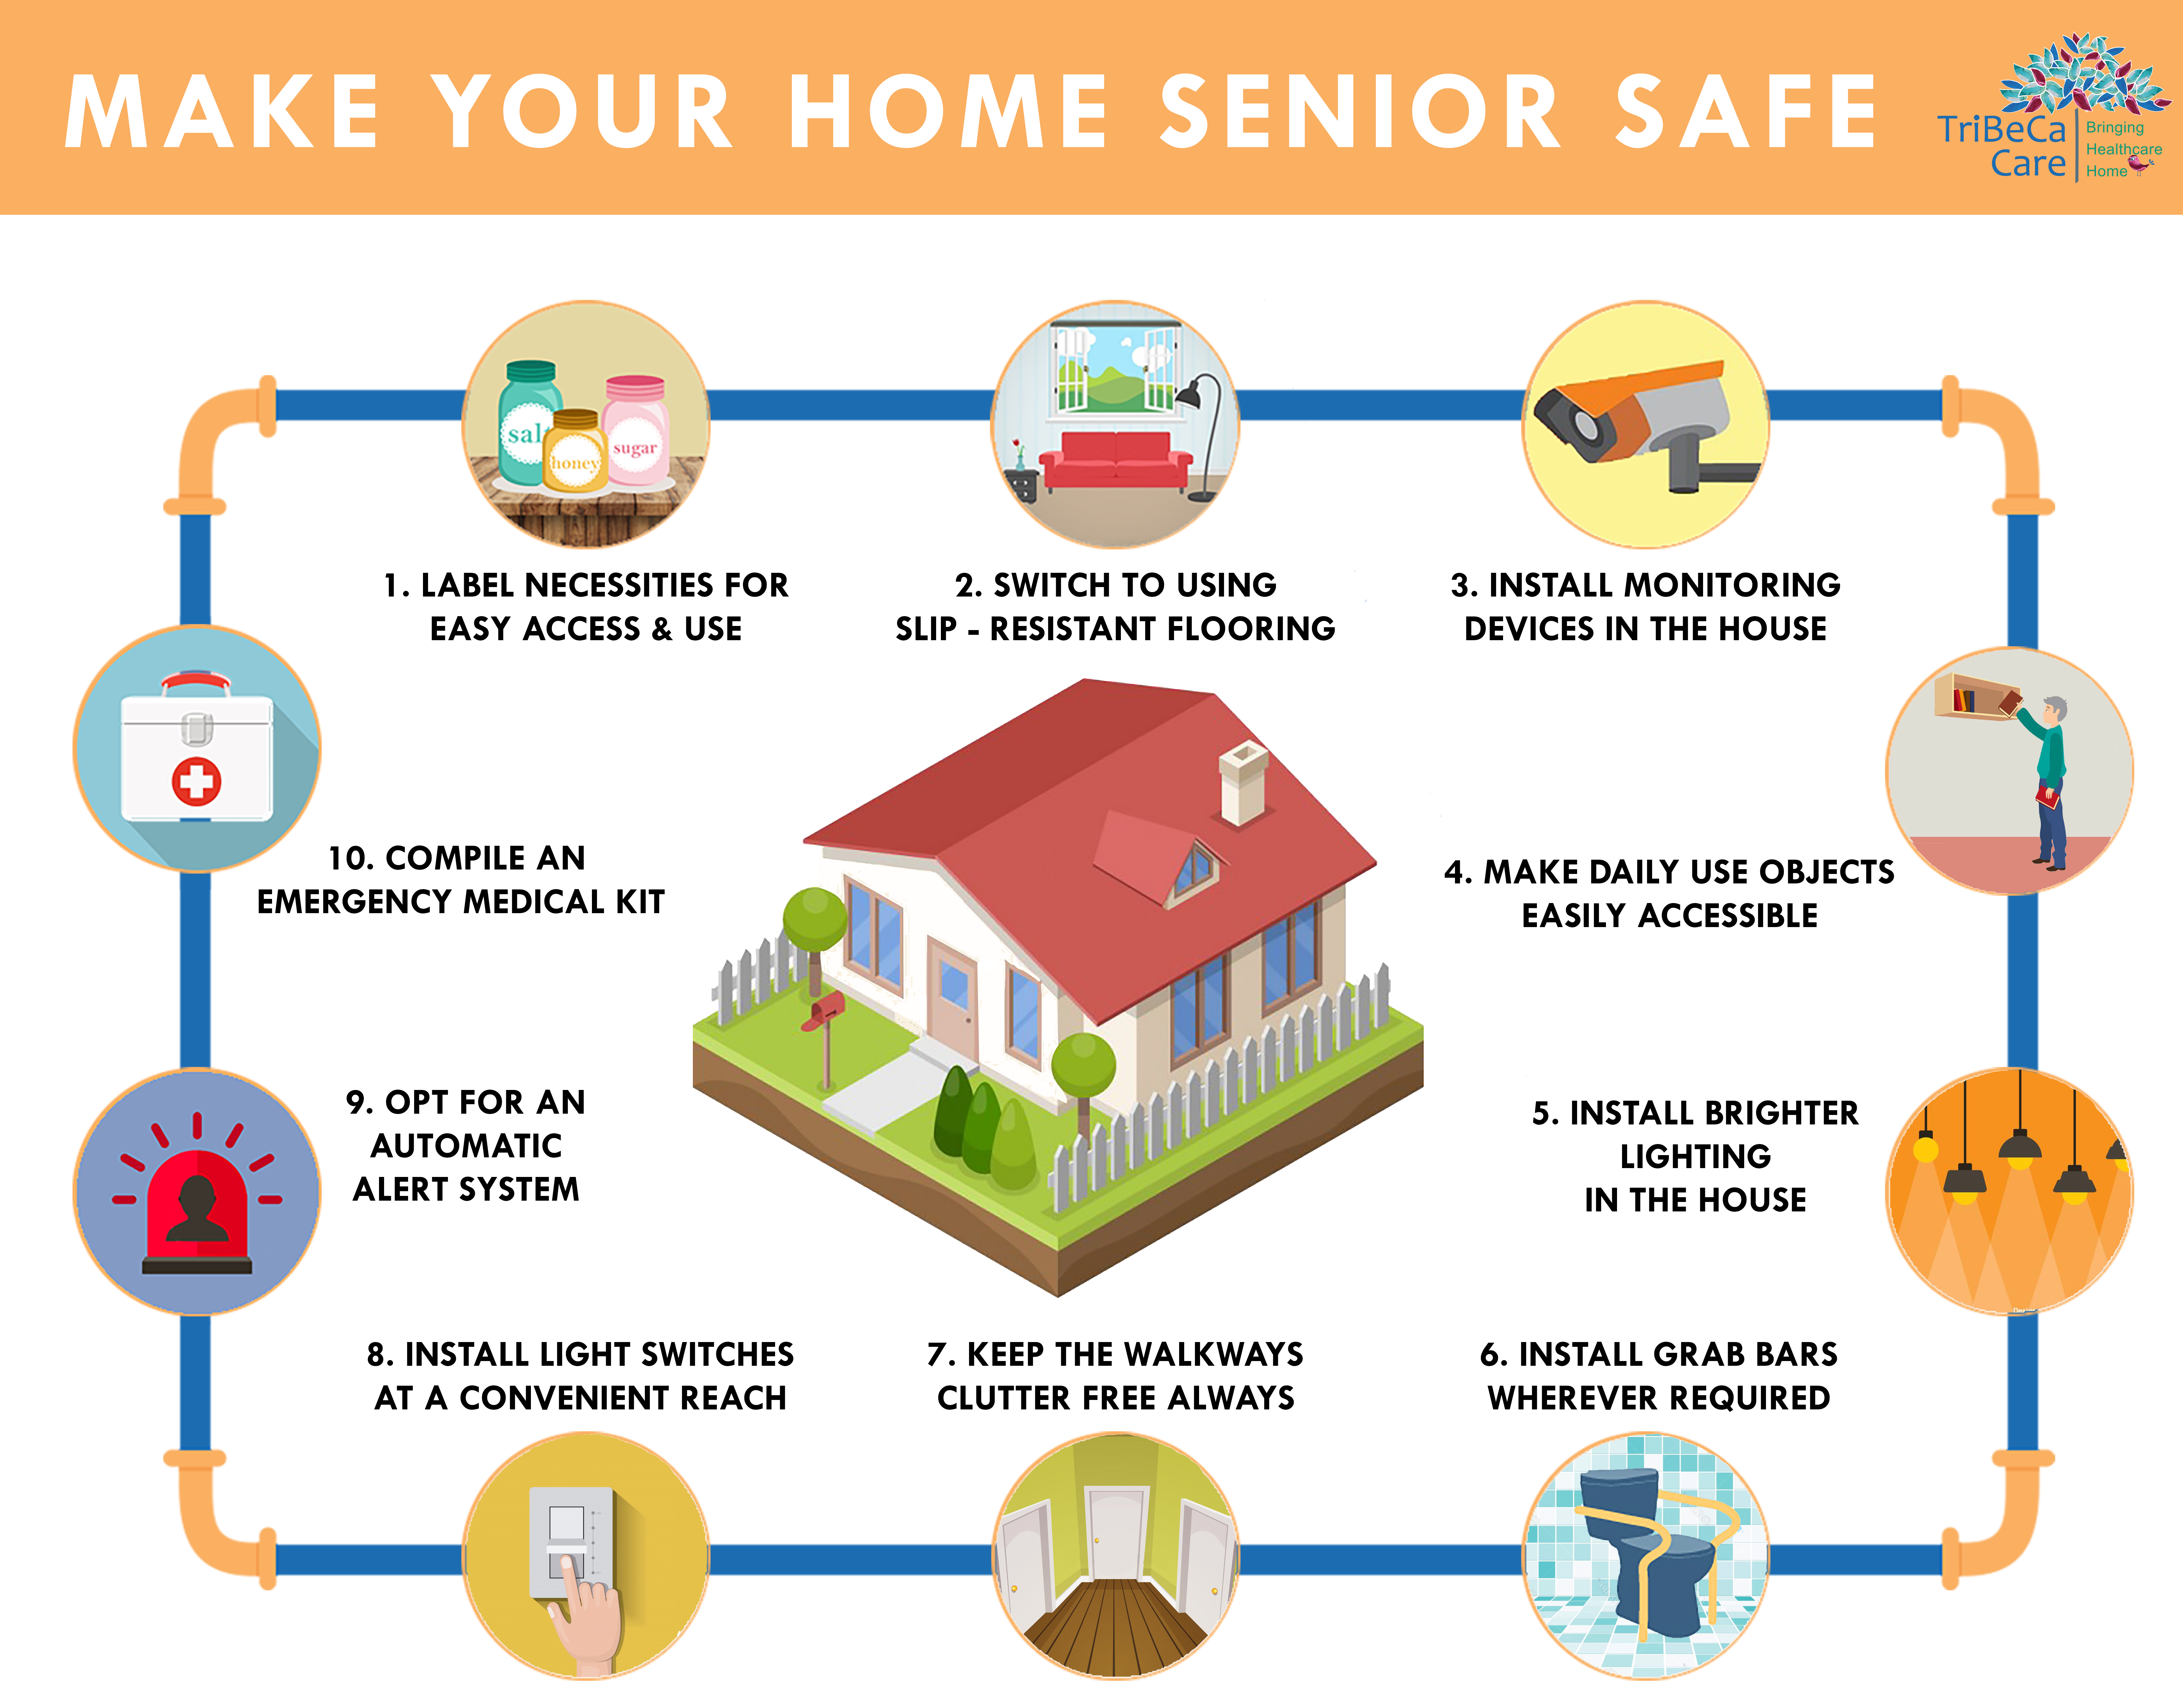 10 Must Haves for Senior Safety Tribeca Care Caregiver